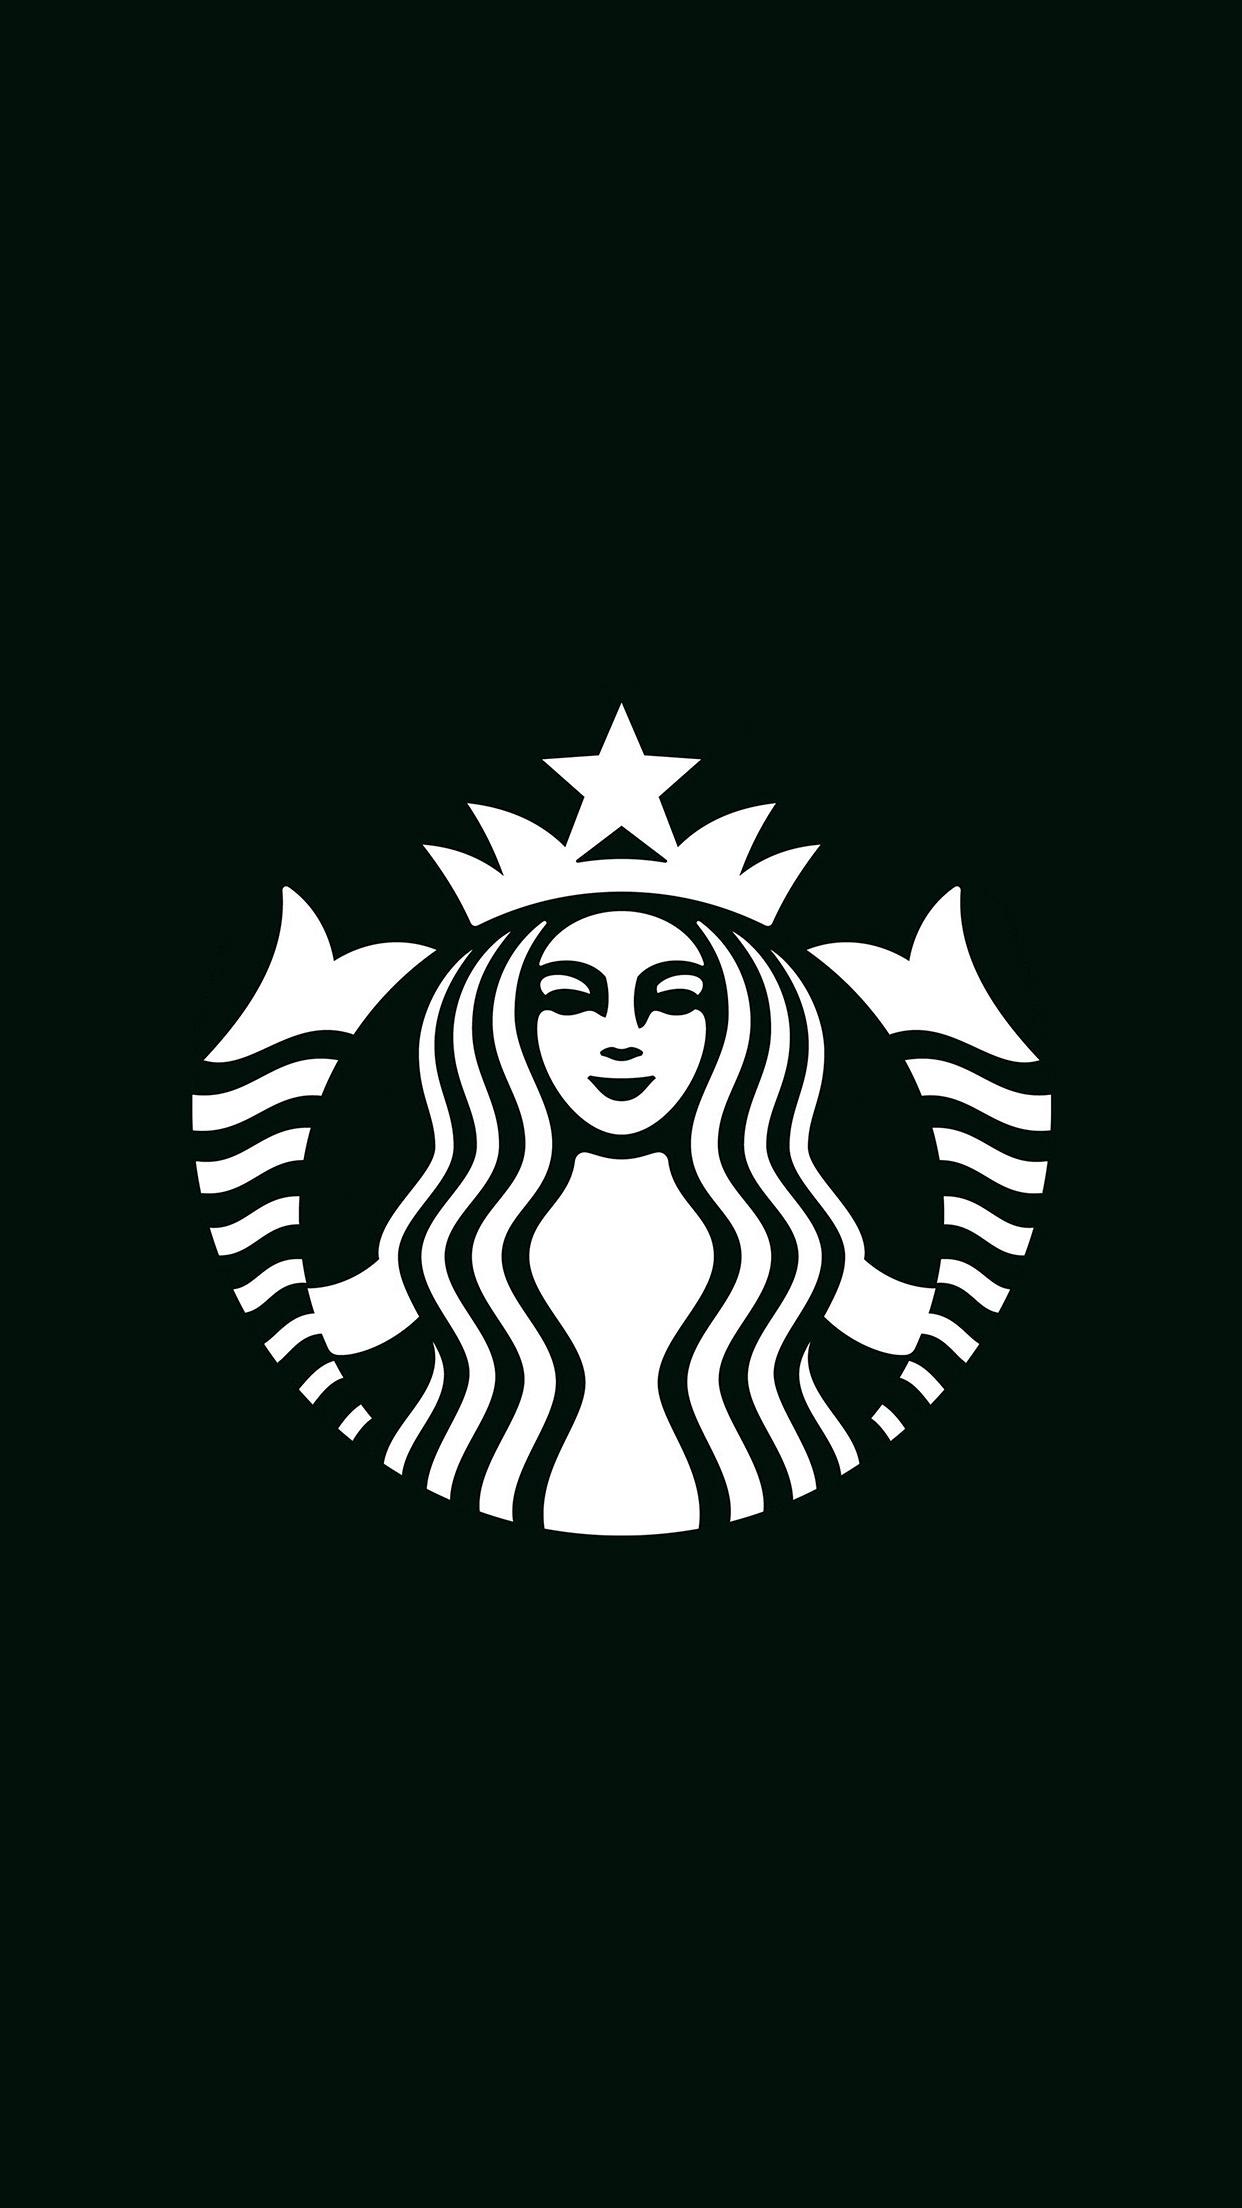 Iphonepapers Com Iphone Wallpaper Ax30 Starbucks Logo